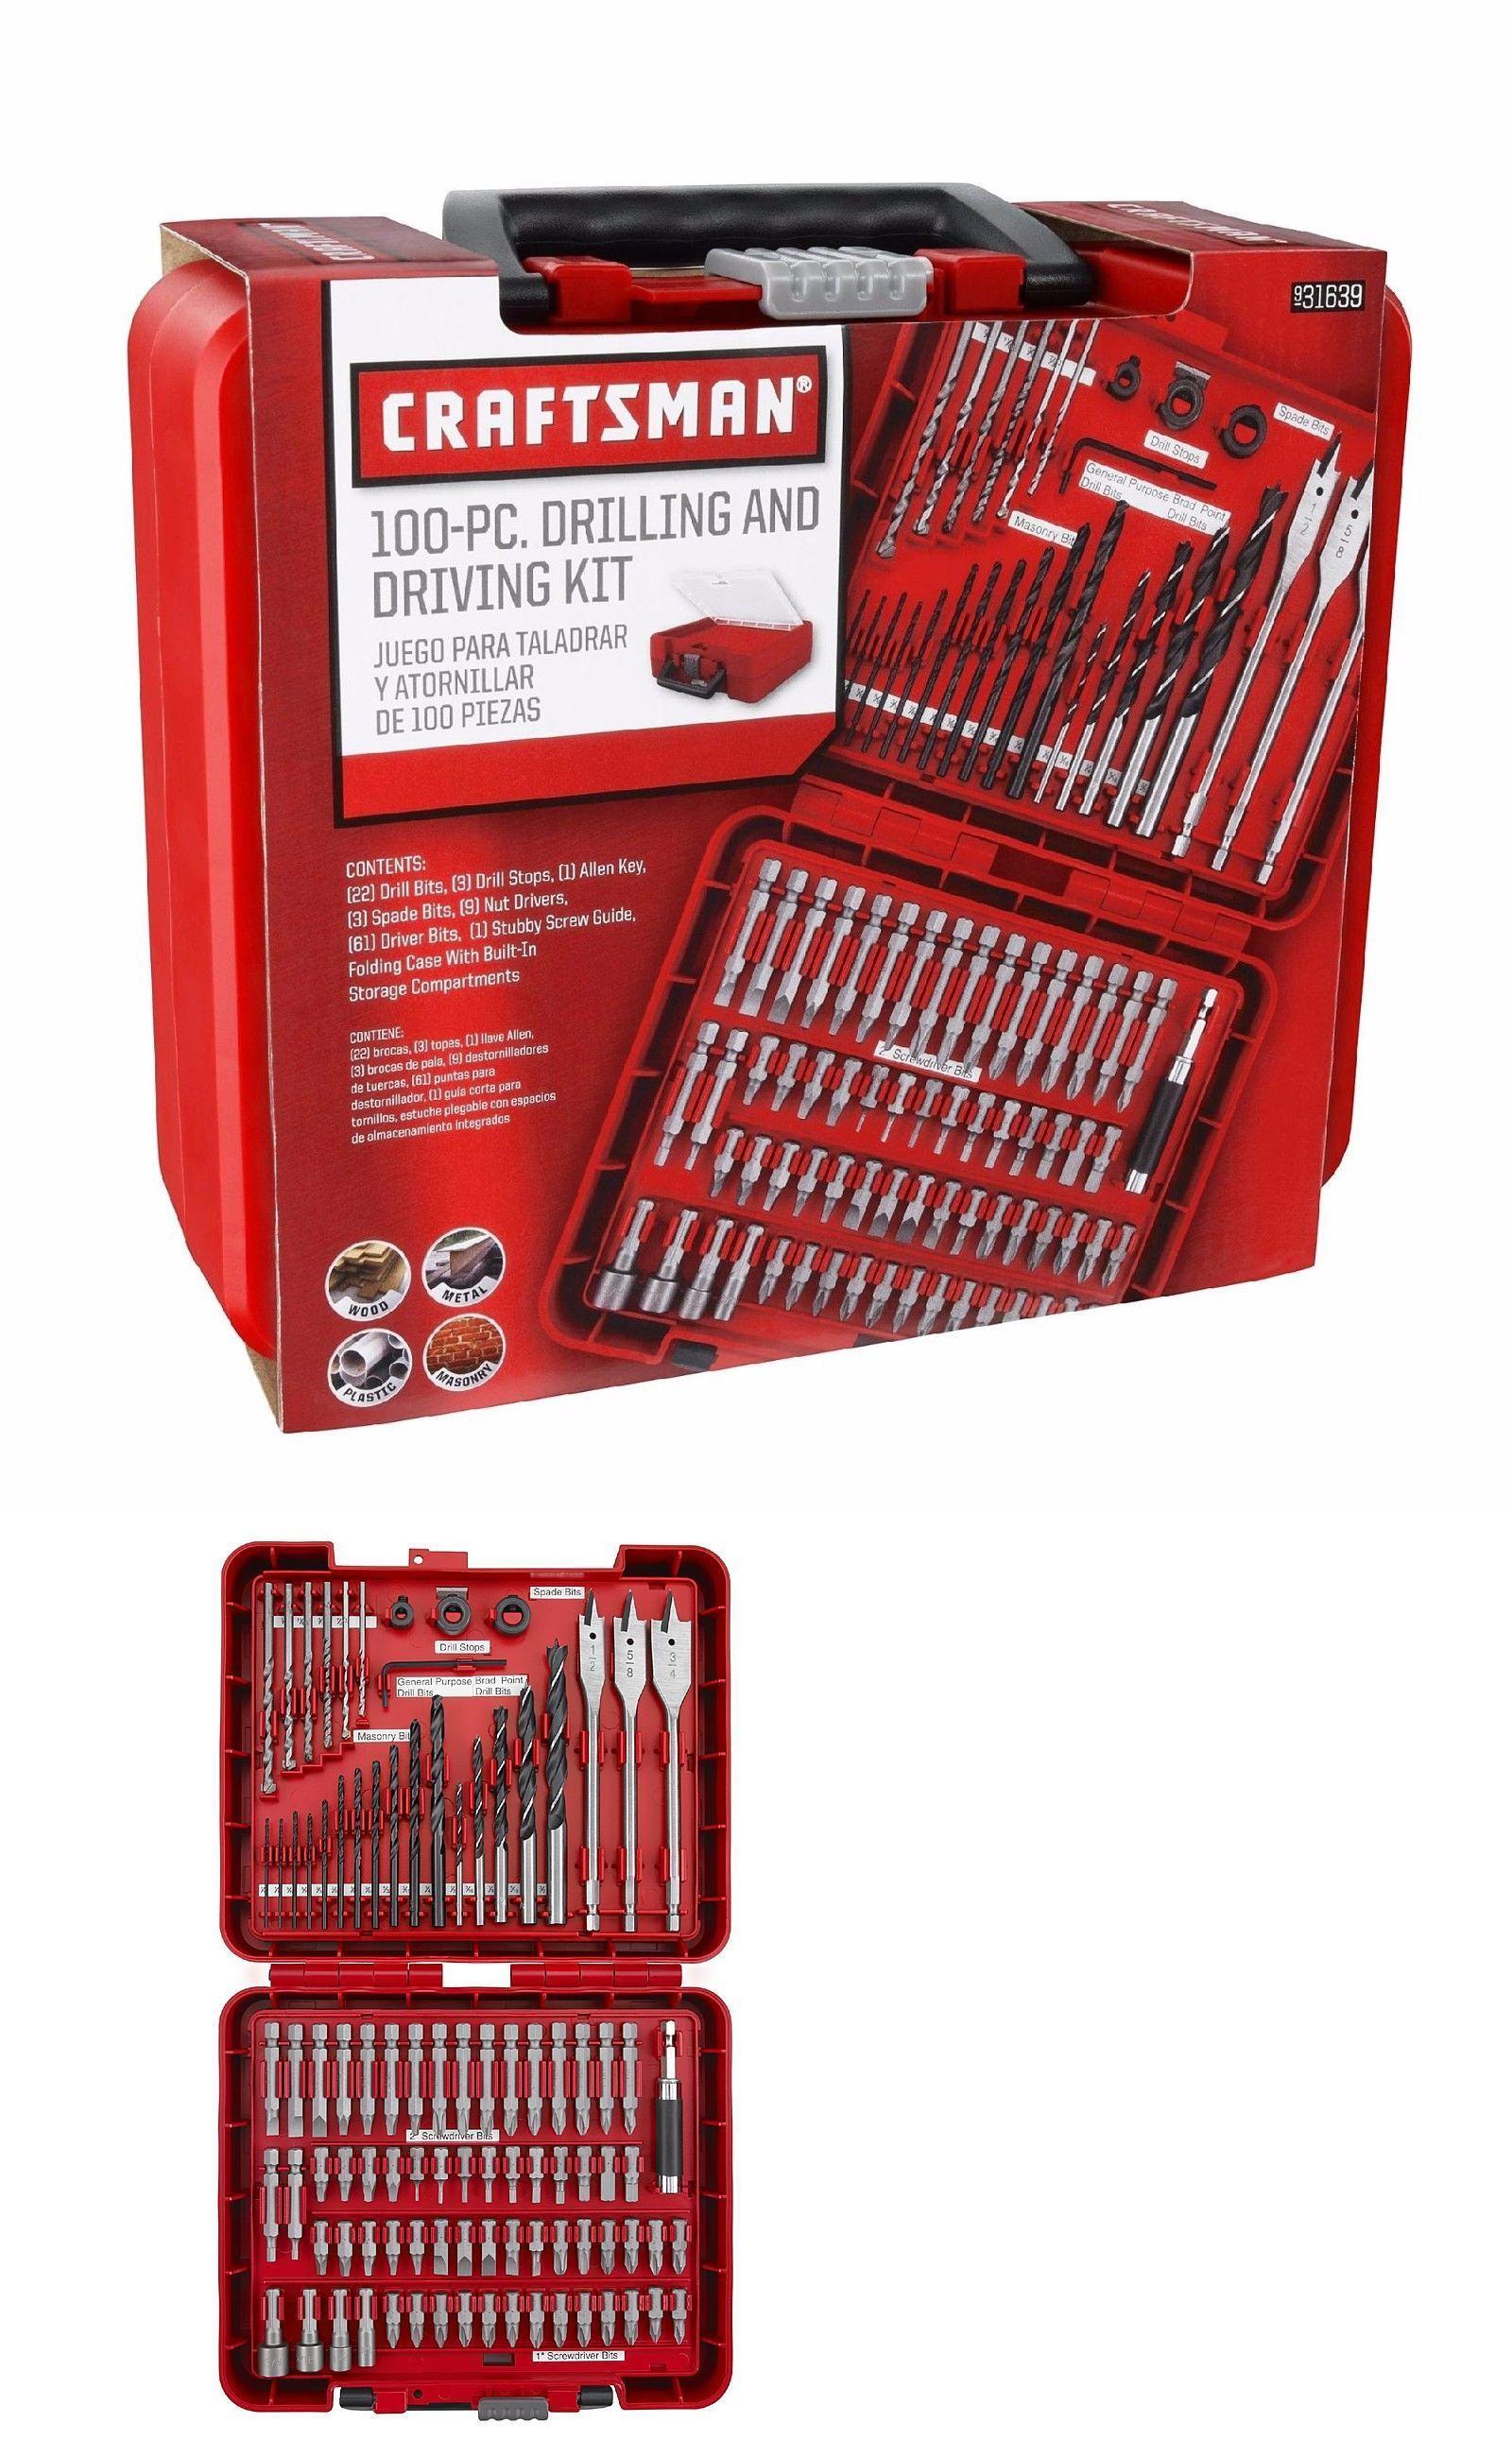 Craftsman 450 Piece Mechanic/'s Tool Set with 3 Drawer Case Box 450pc 99040